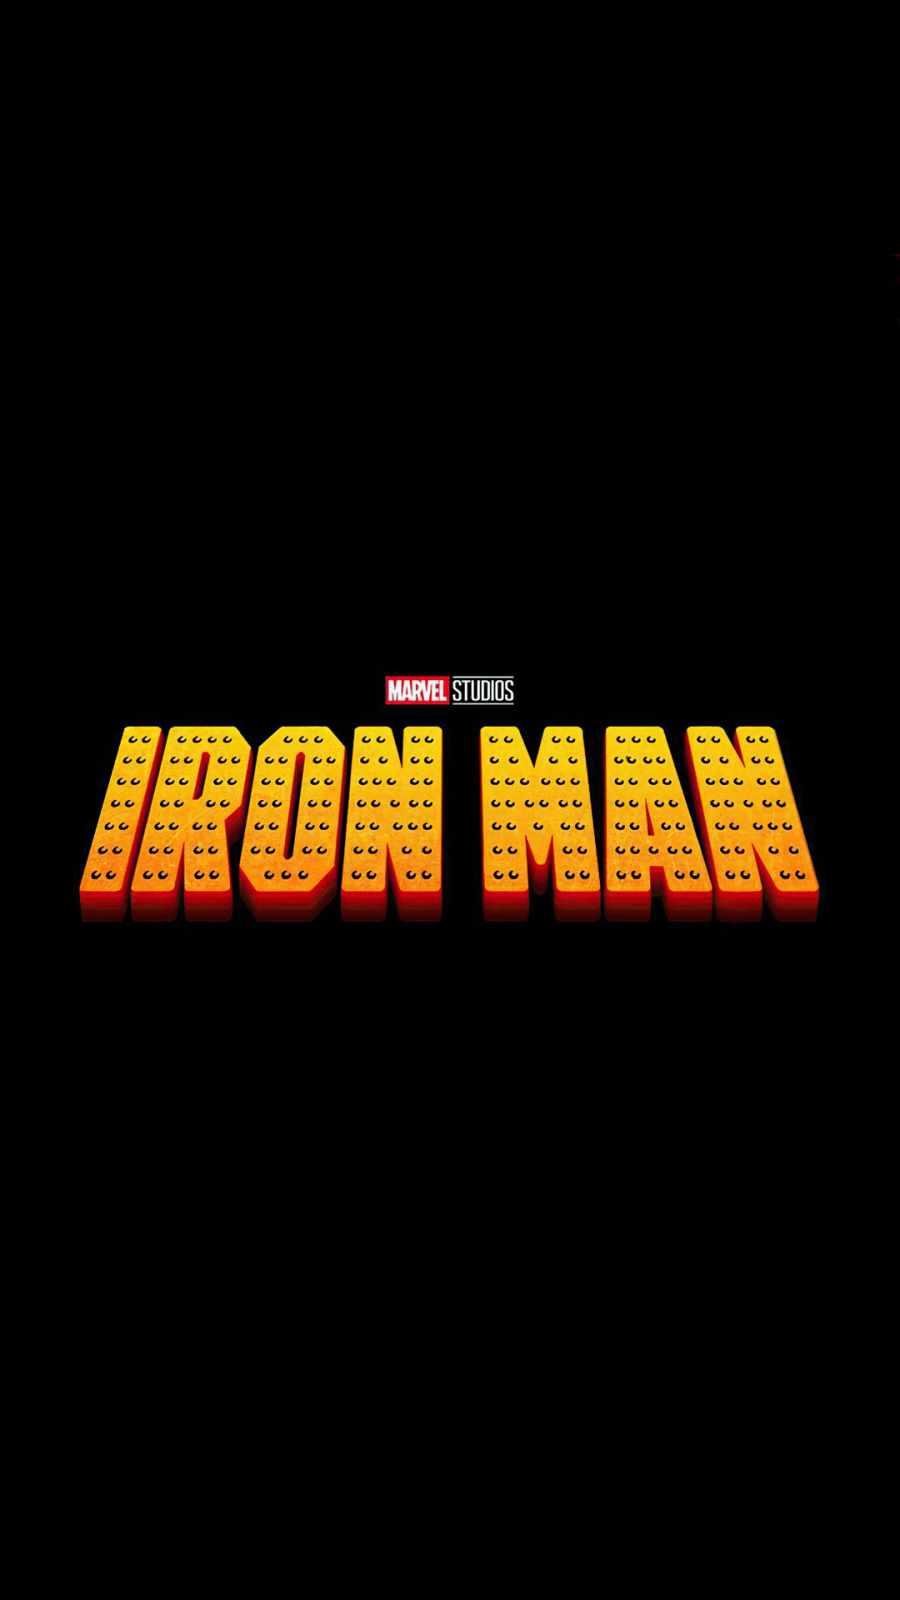 iron man movie typography